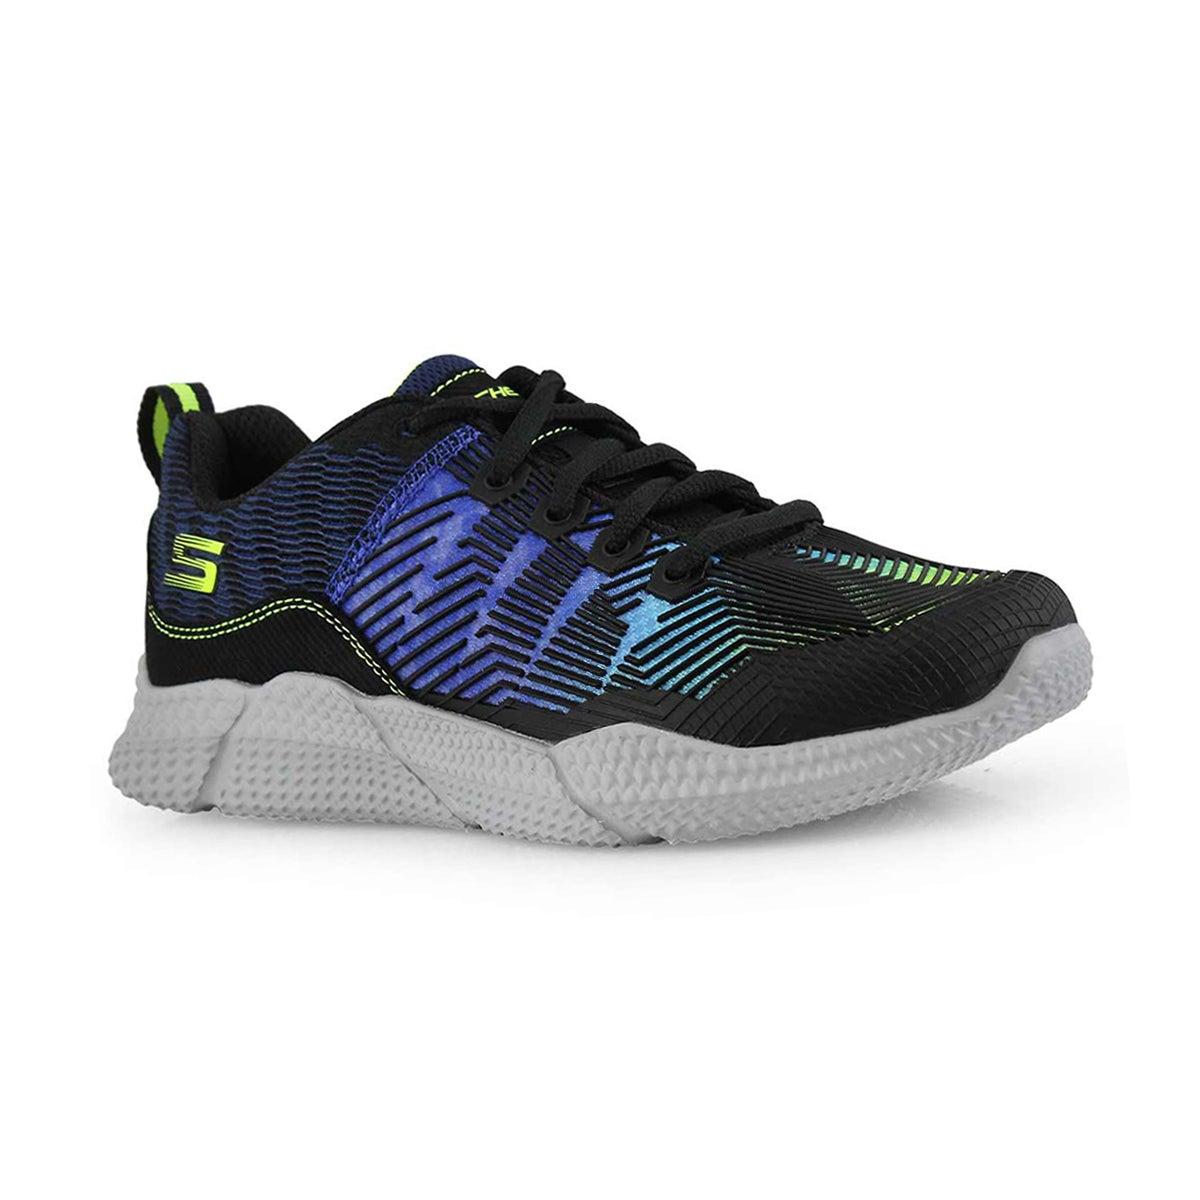 Bys Intersectors blu/lme lace up sneaker